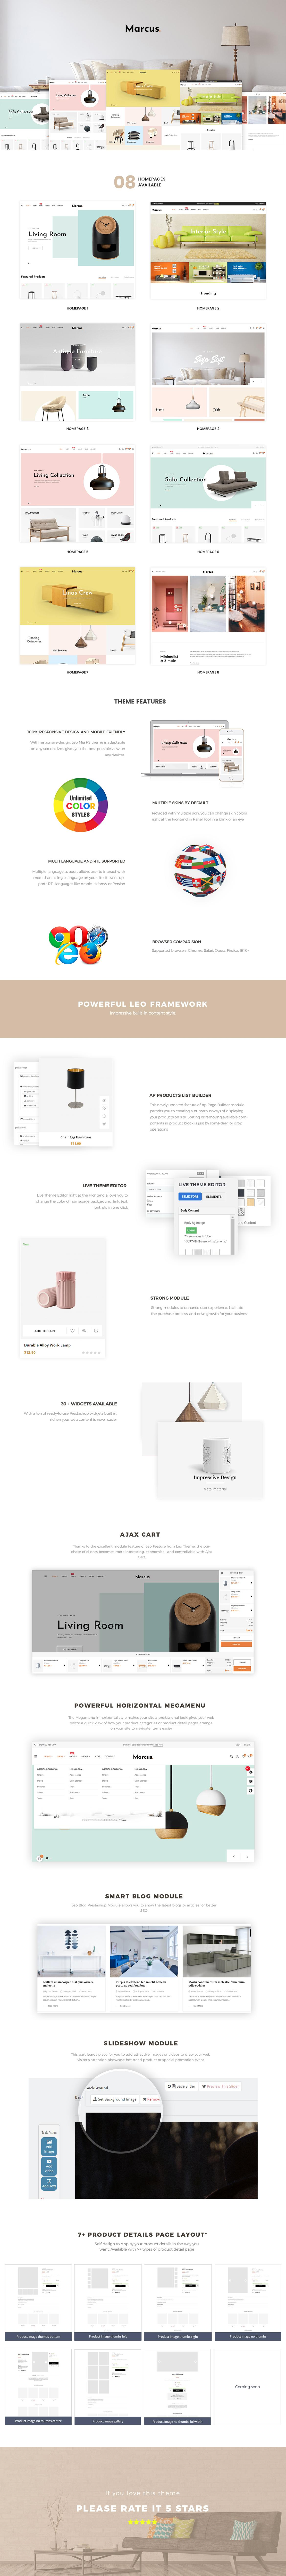 Marcus - Furniture & Home Decor prestashop 1.7 themes